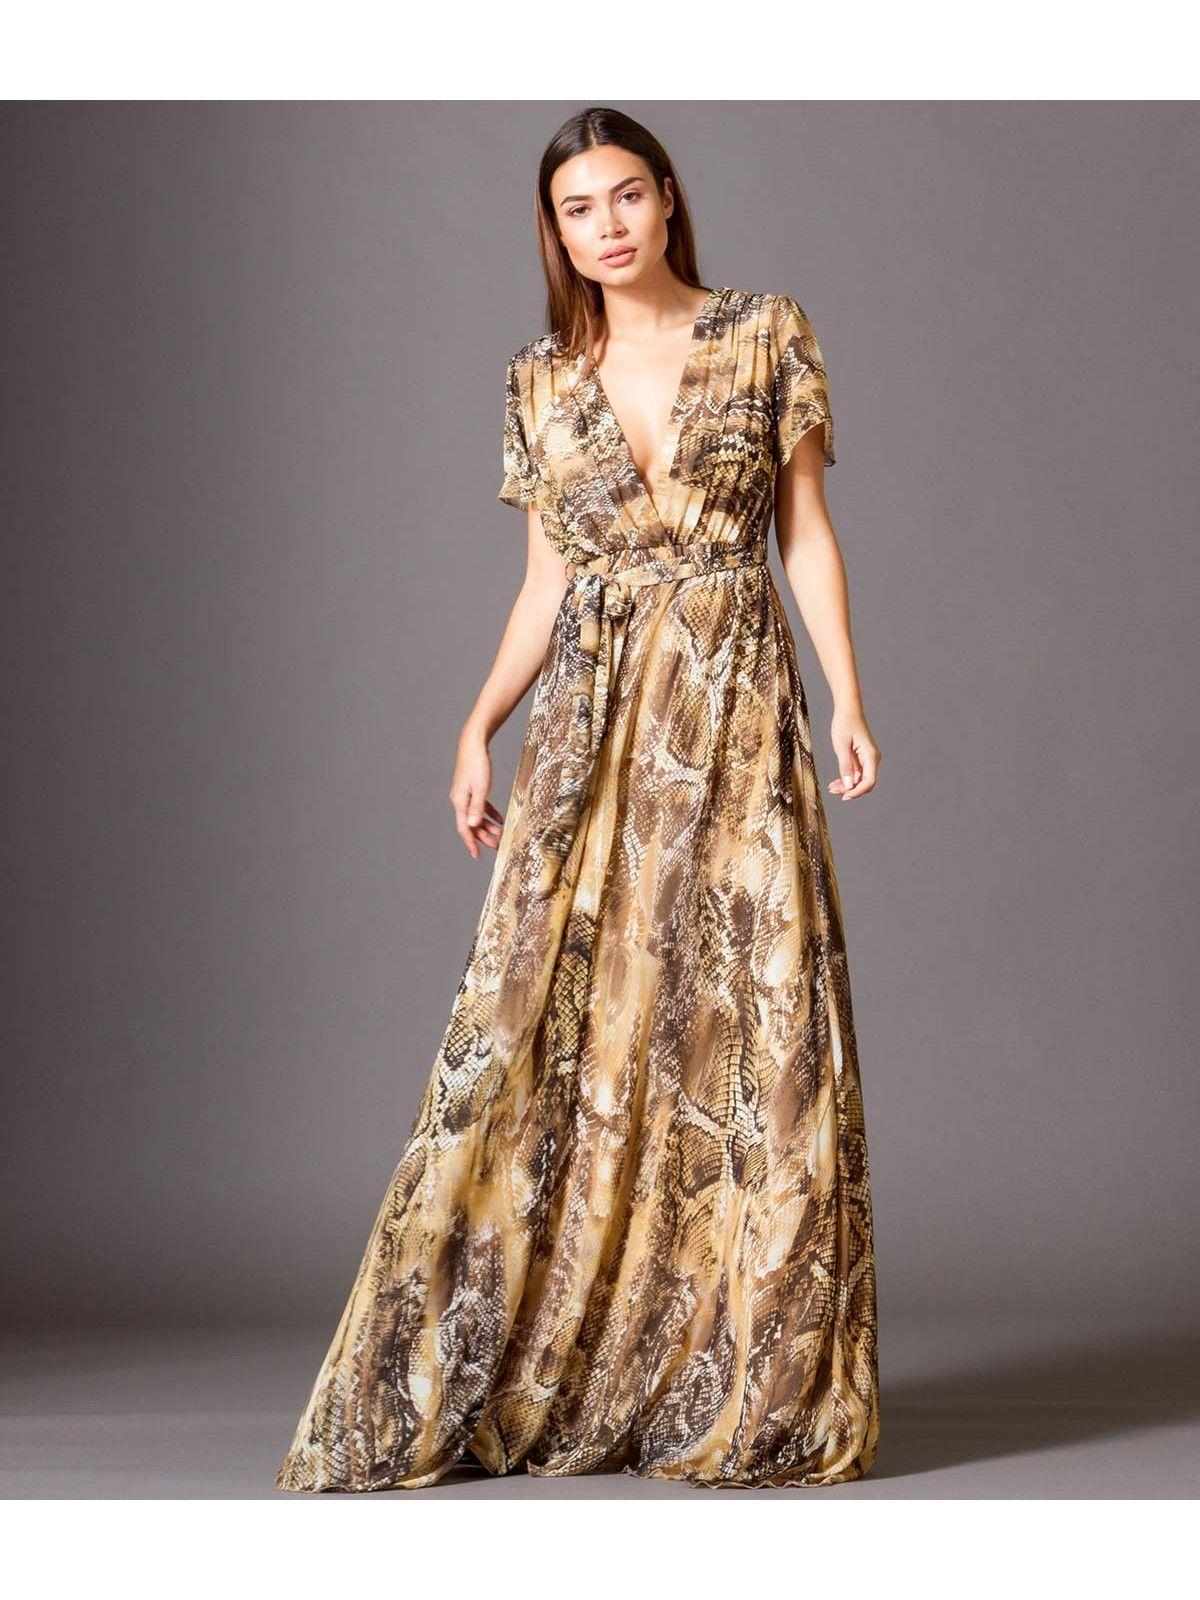 Eμπριμέ Maxi Φόρεμα με Βε και Βολάν - Εμπριμέ φιδέ  7547593a6ca